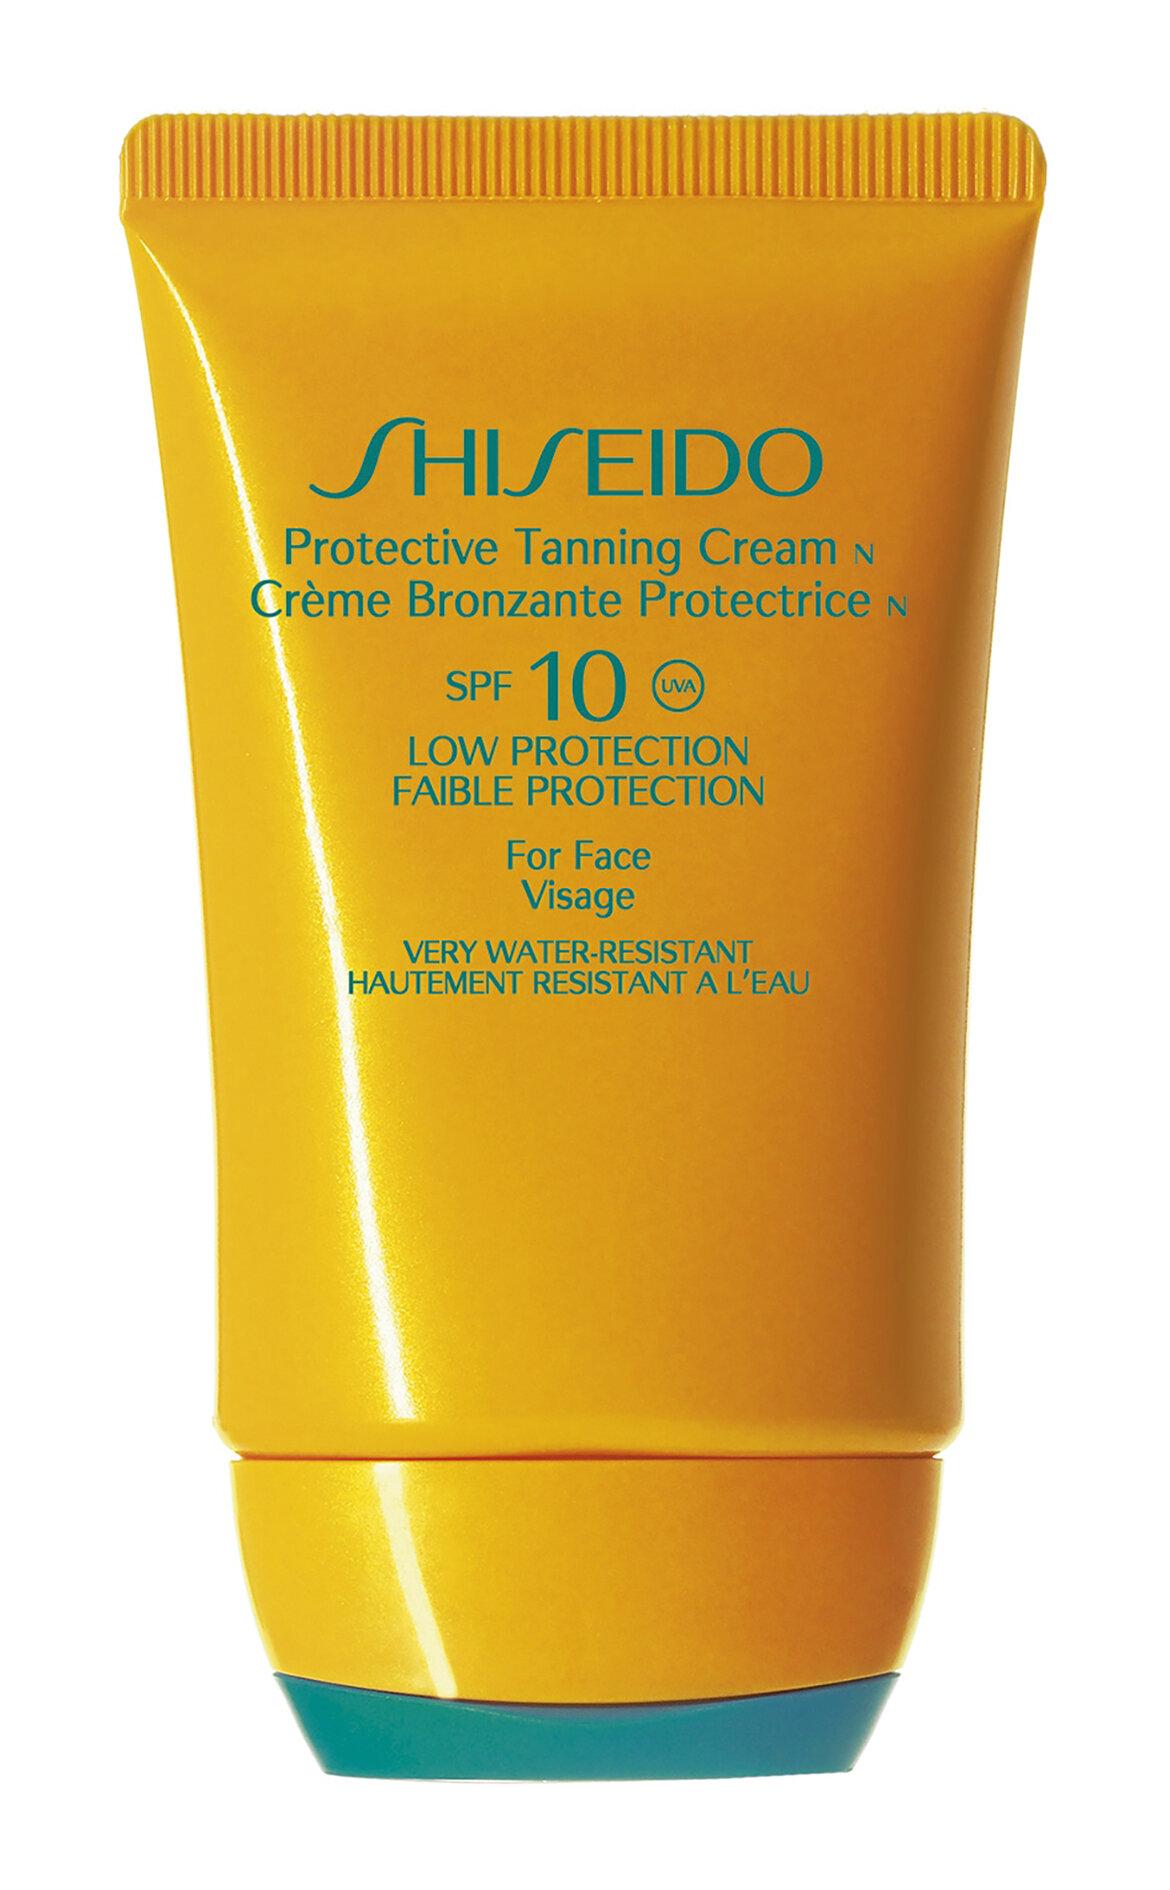 Shiseido-Shiseido Gsc Protective Tanning Cream Spf 10 50 ml Güneş Kremi